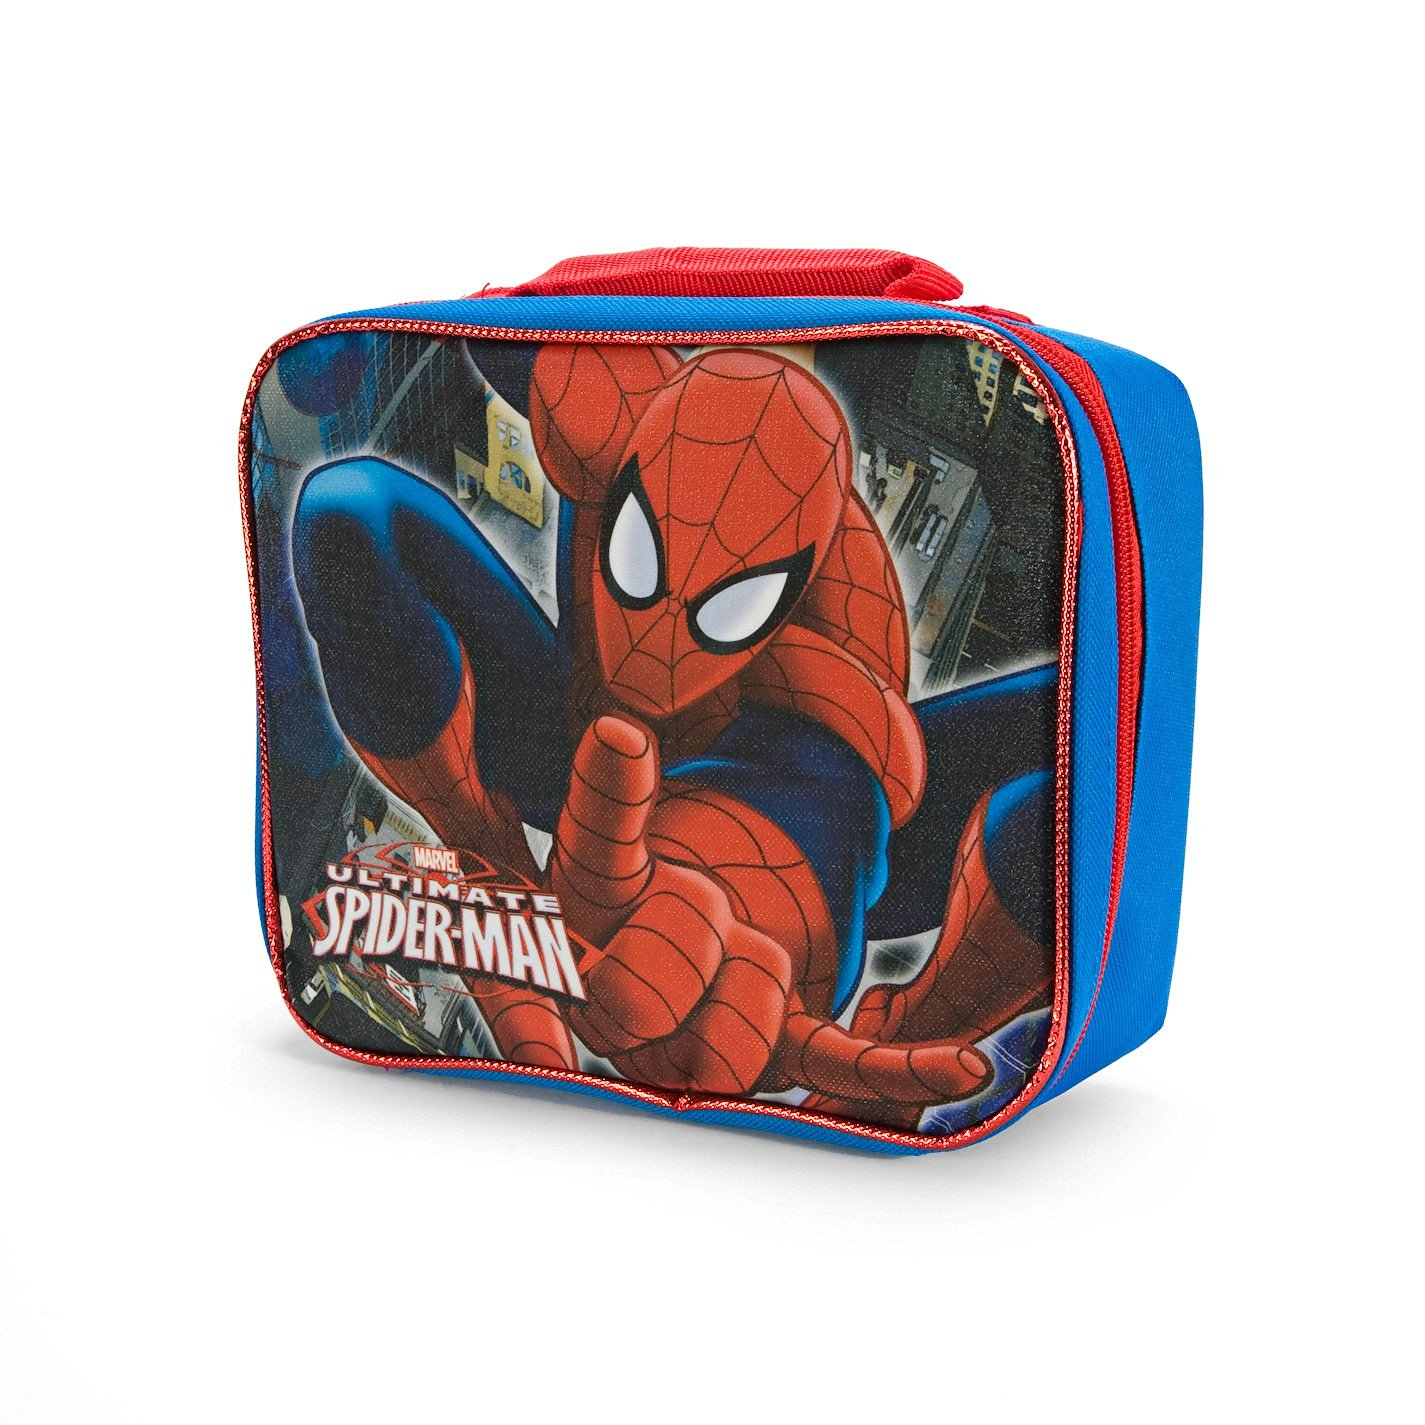 Marvel Ultimate Spider-Man Lunch Box Kit